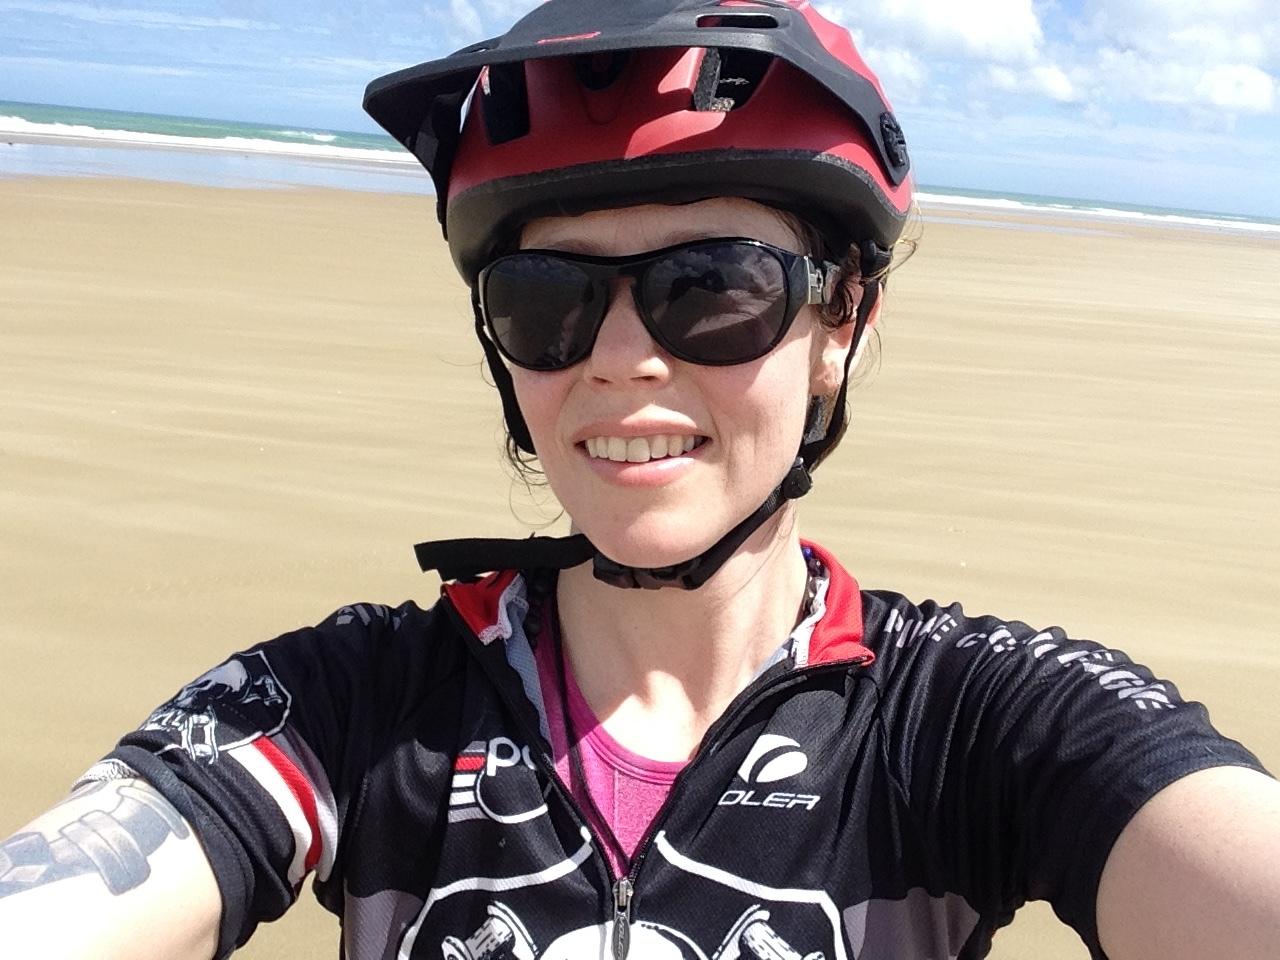 selfie 90 mile beach tour aotearoa new zealand.JPG